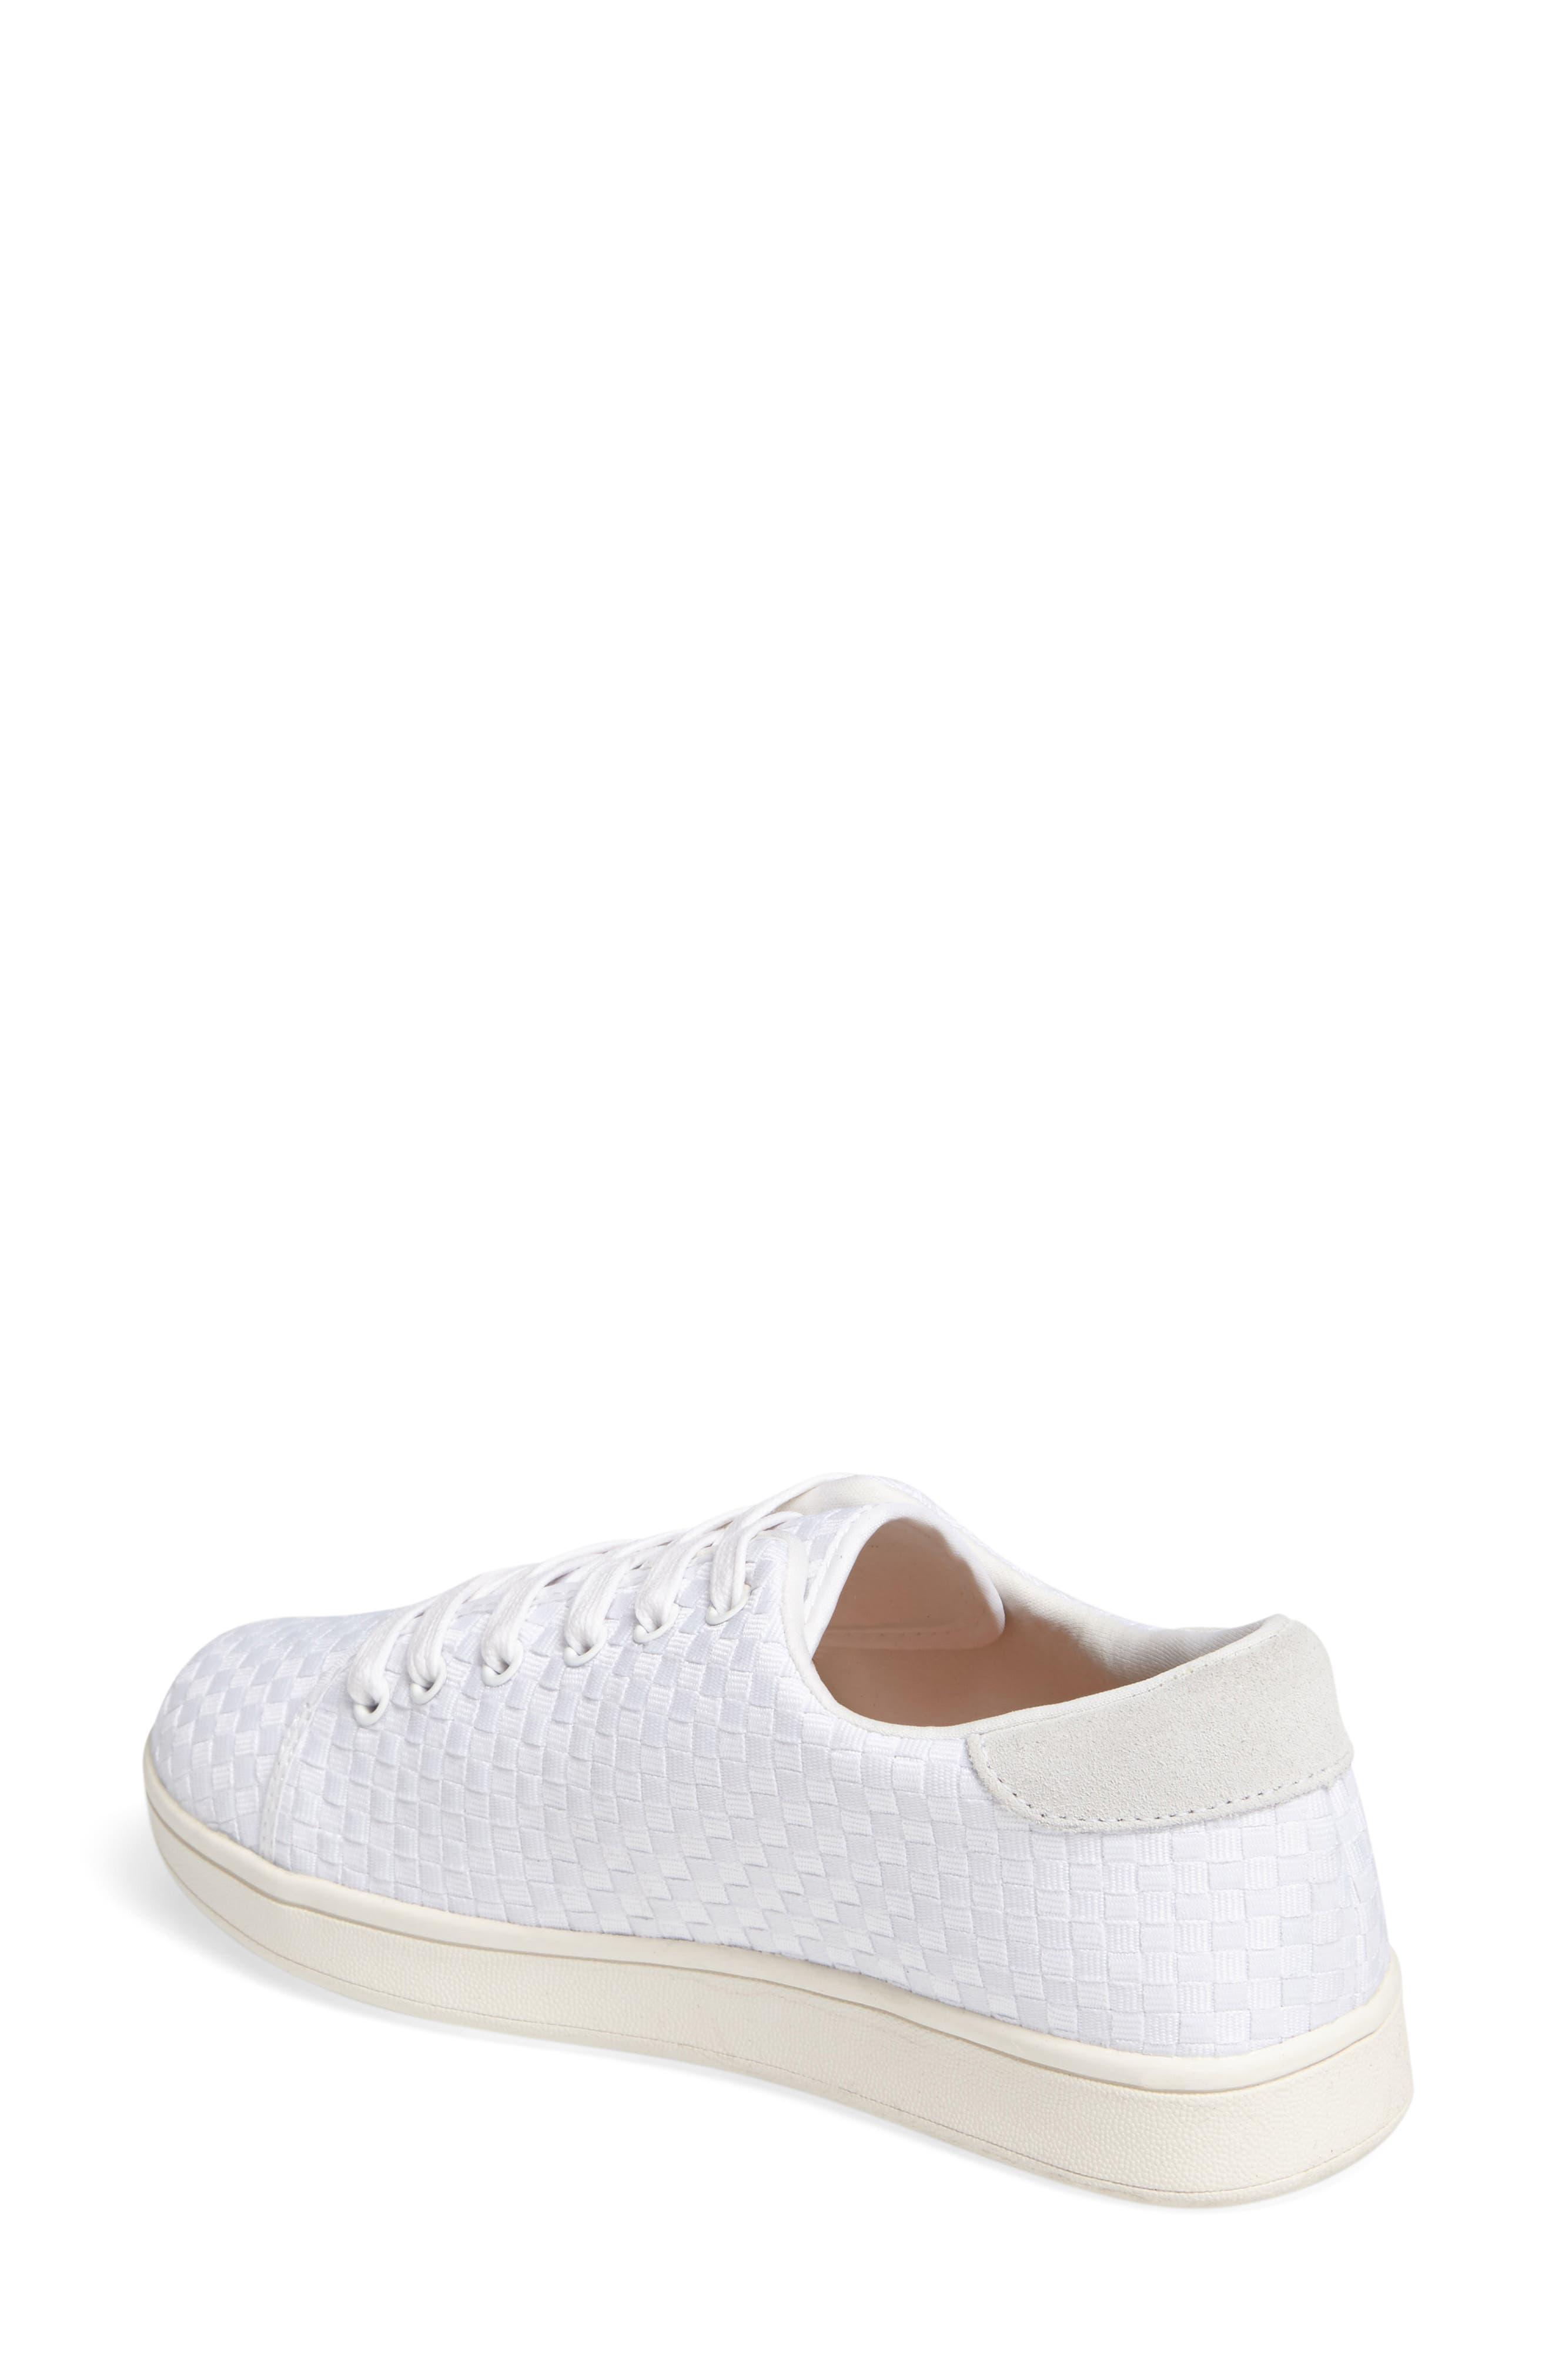 Daphne Sneaker,                             Alternate thumbnail 2, color,                             100